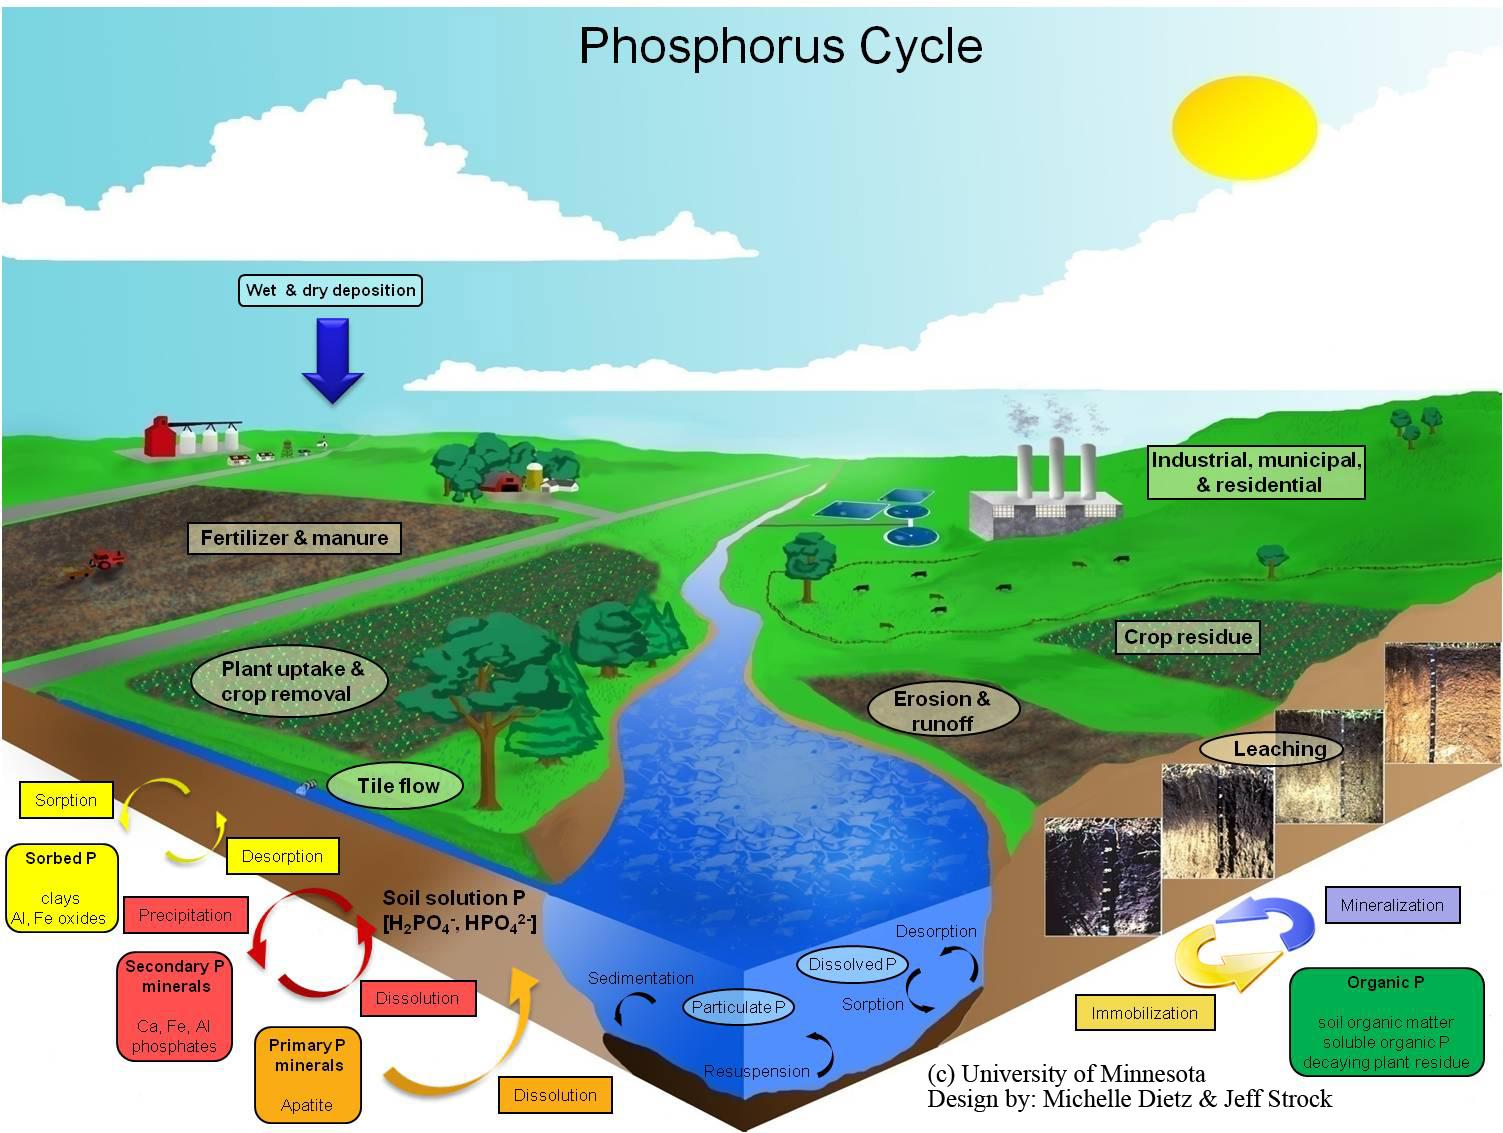 TAT ASMI PRABHU - FIFTH MAHAVAKYA - ANIMATE VS INANIMATE DUALISM. PHOSPHORUS CYCLE DESCRIBES CYCLICAL FLOW OF CHEMICAL MOLECULES FROM INANIMATE TO ANIMATE.